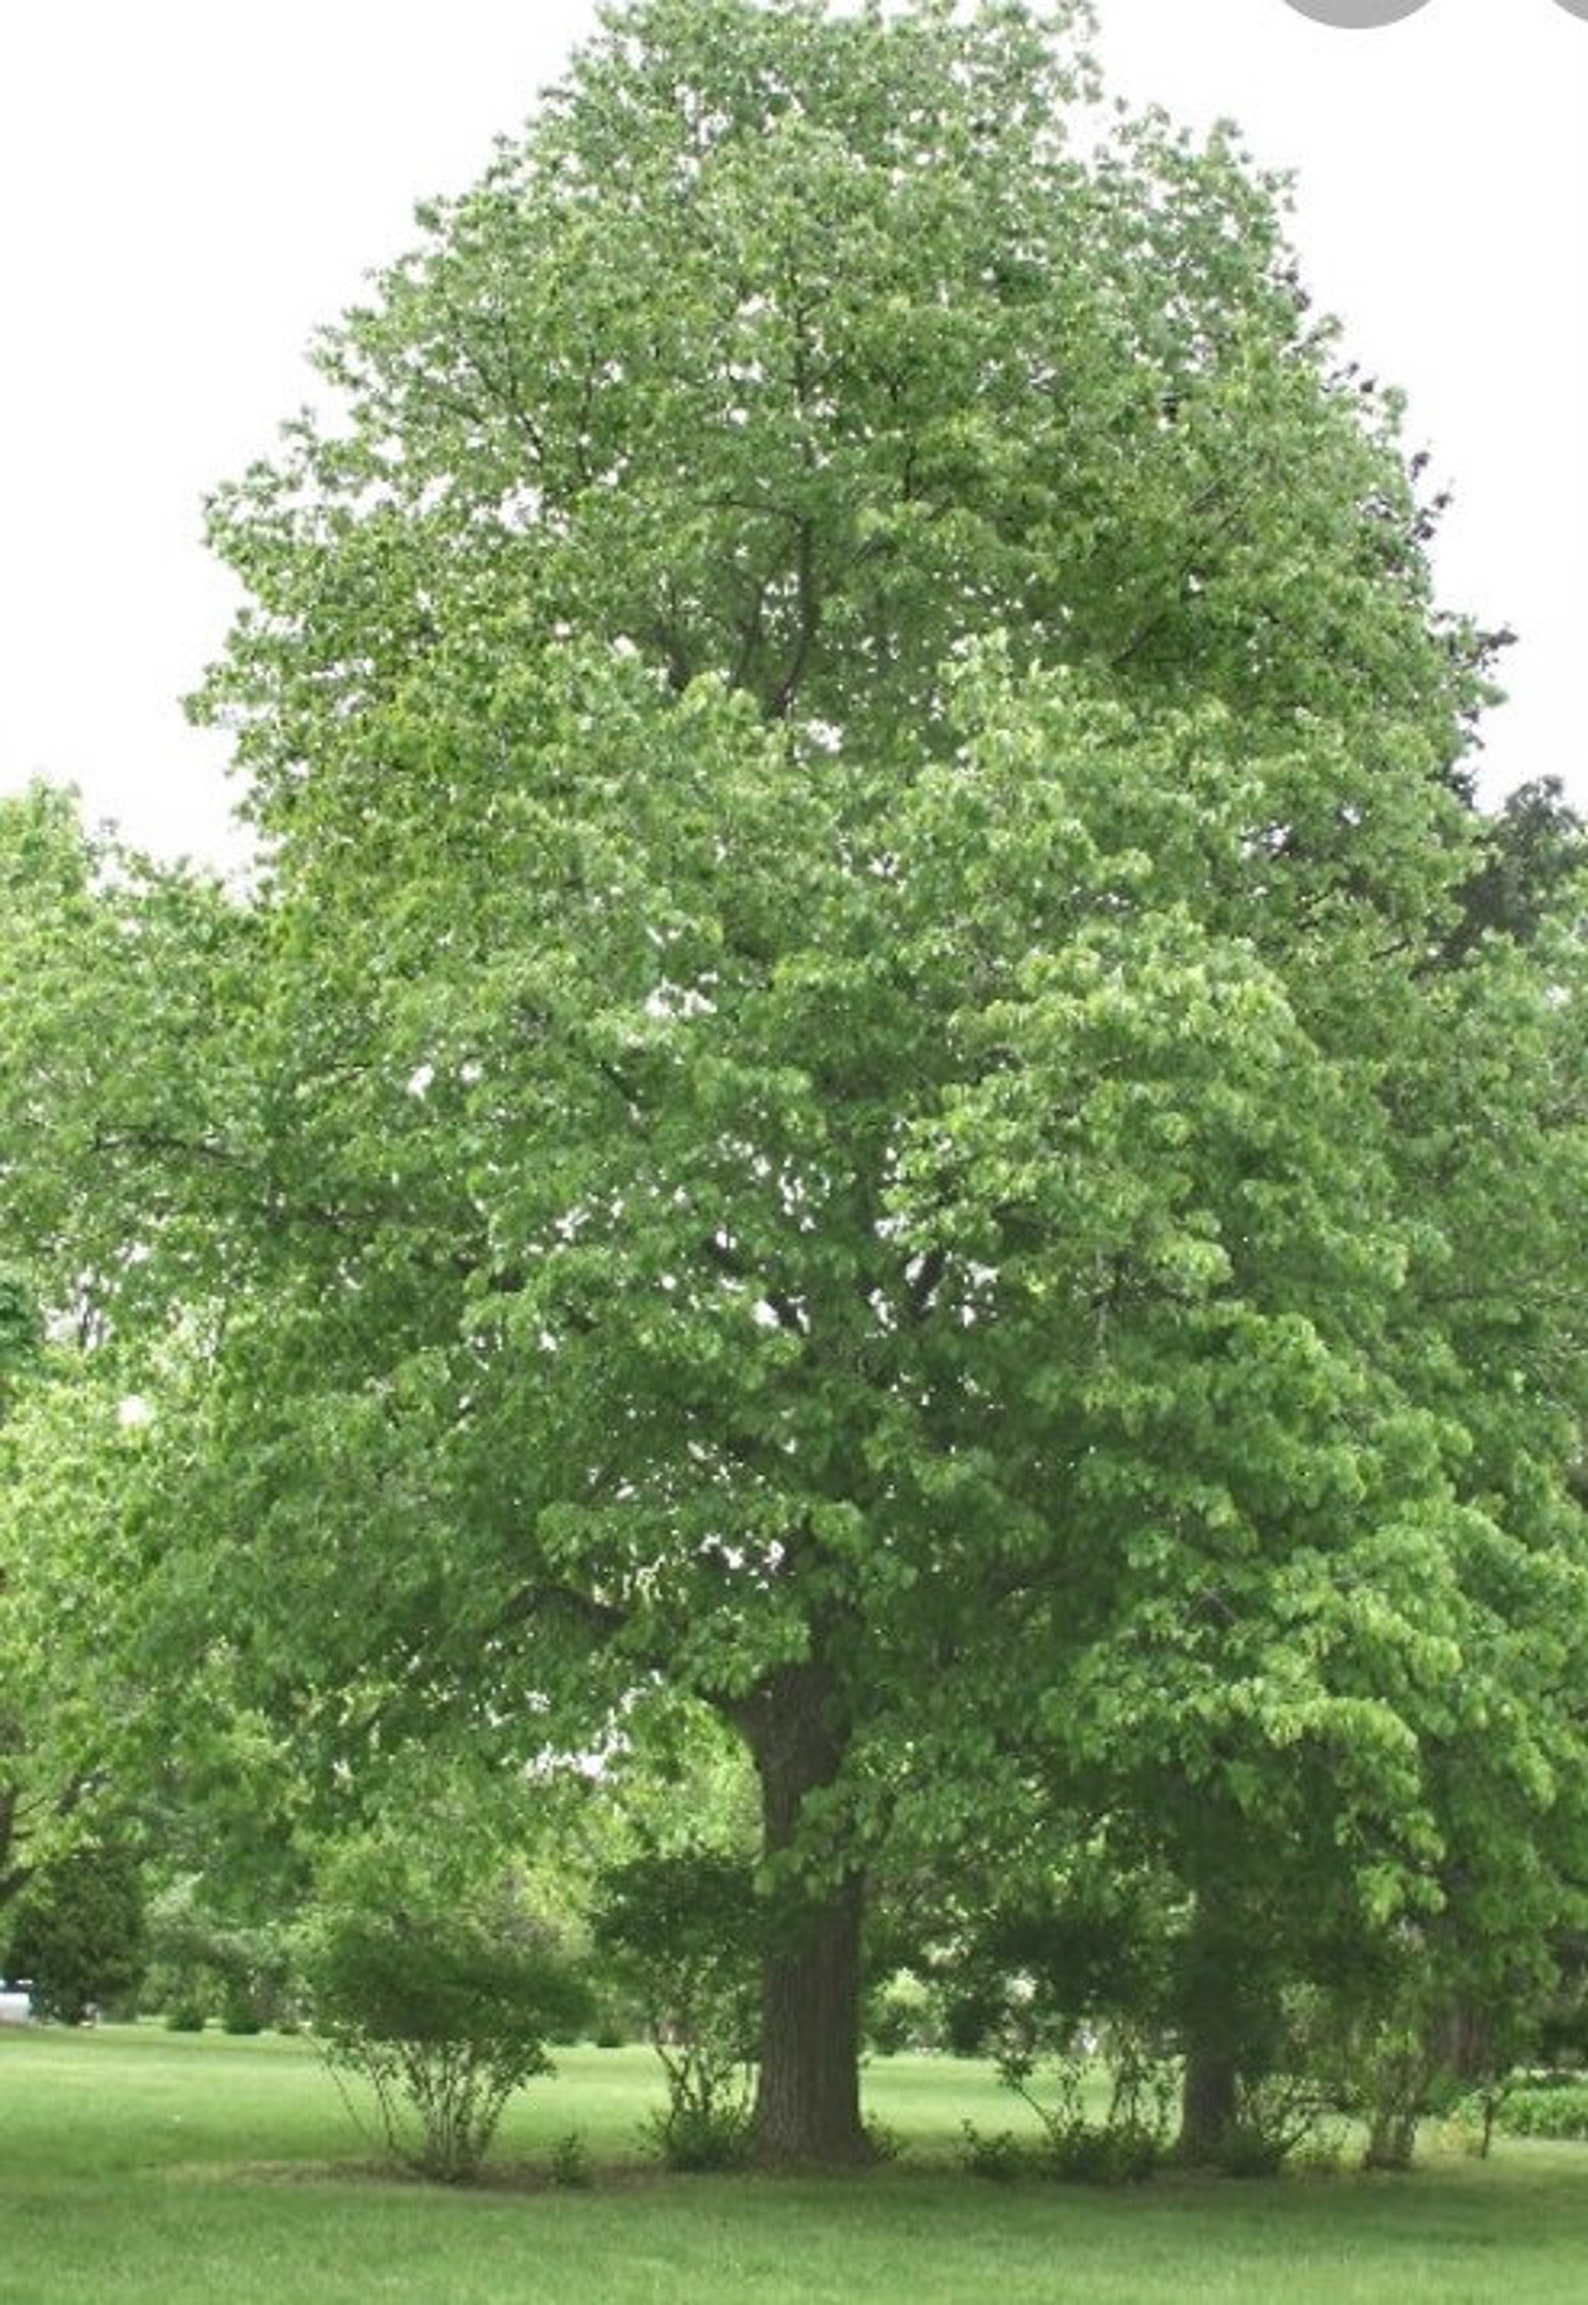 Tilia Americana tree, 1 year old (American basswood) 6-12